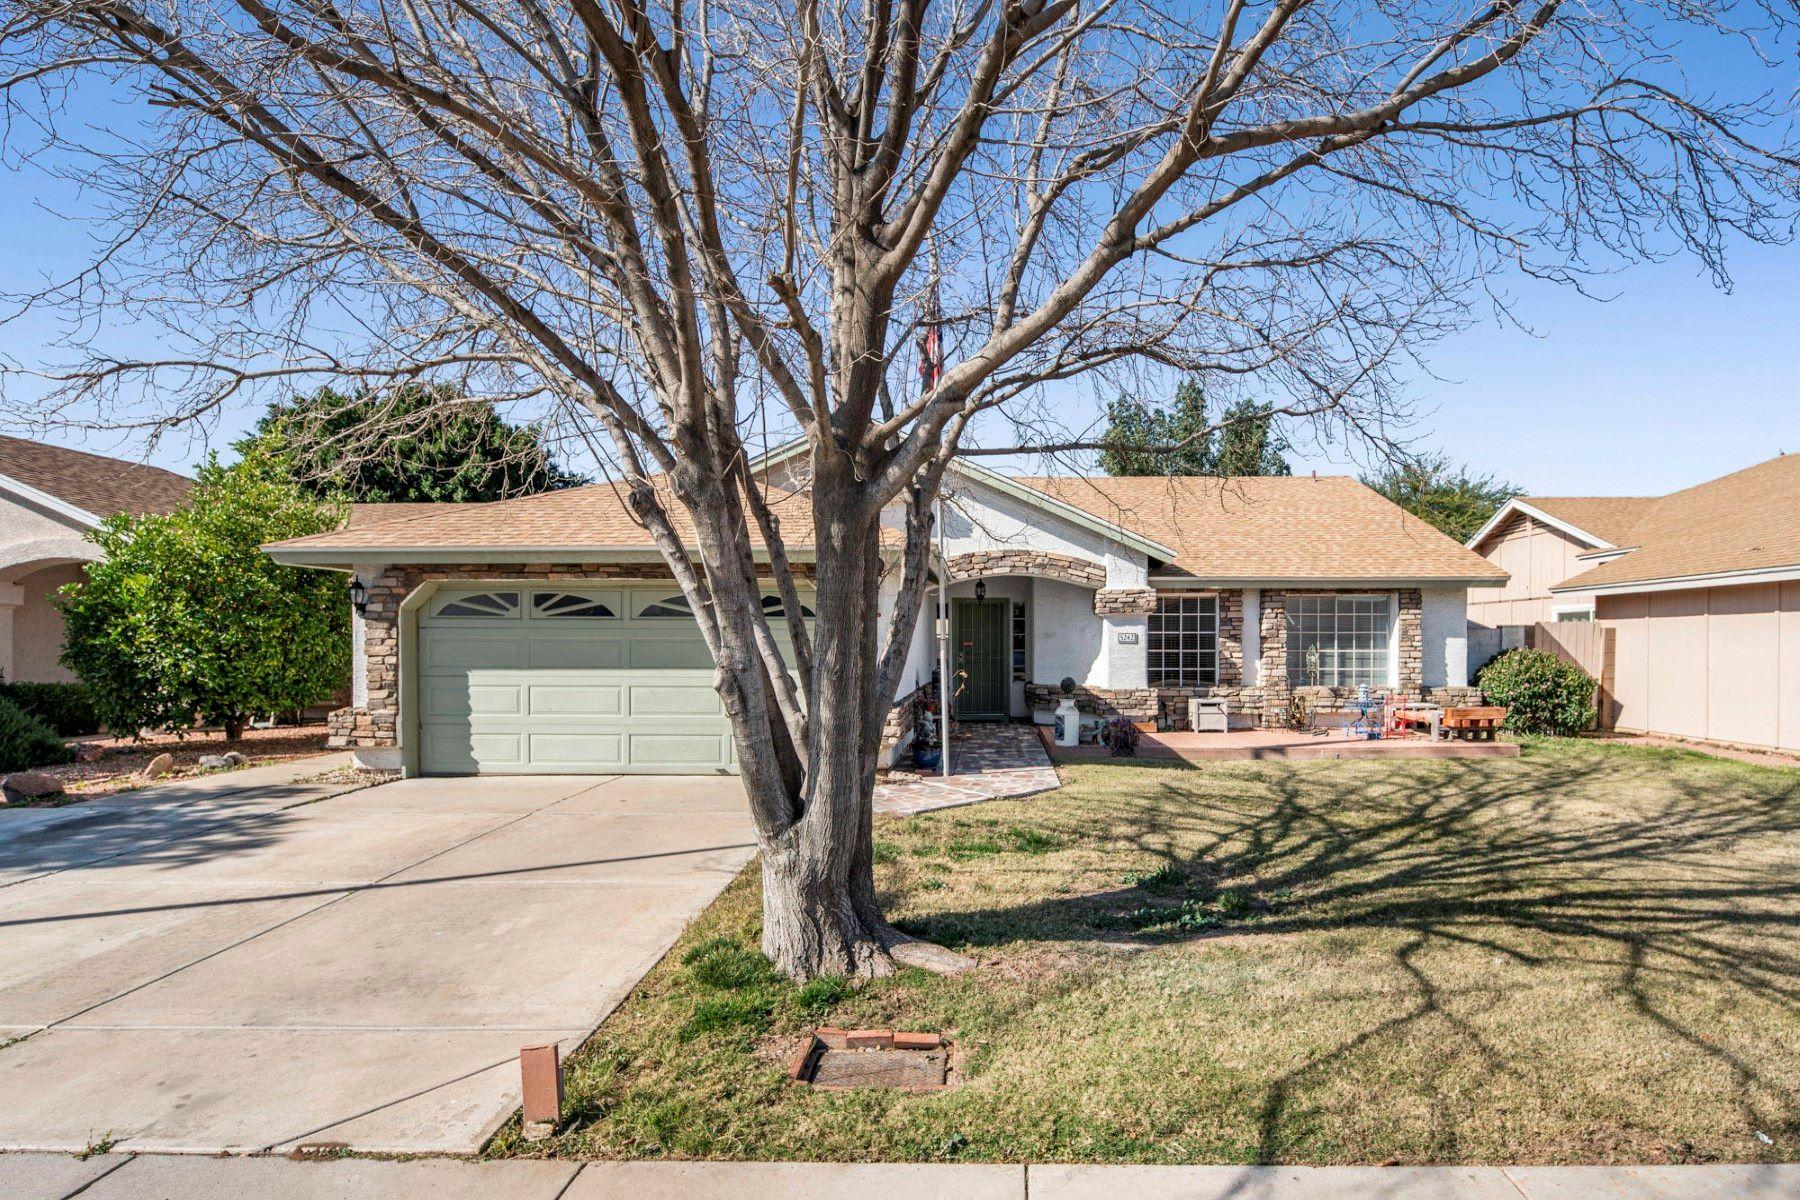 Single Family Homes για την Πώληση στο Camelback Park 5242 N 86TH AVE, Glendale, Αριζονα 85305 Ηνωμένες Πολιτείες